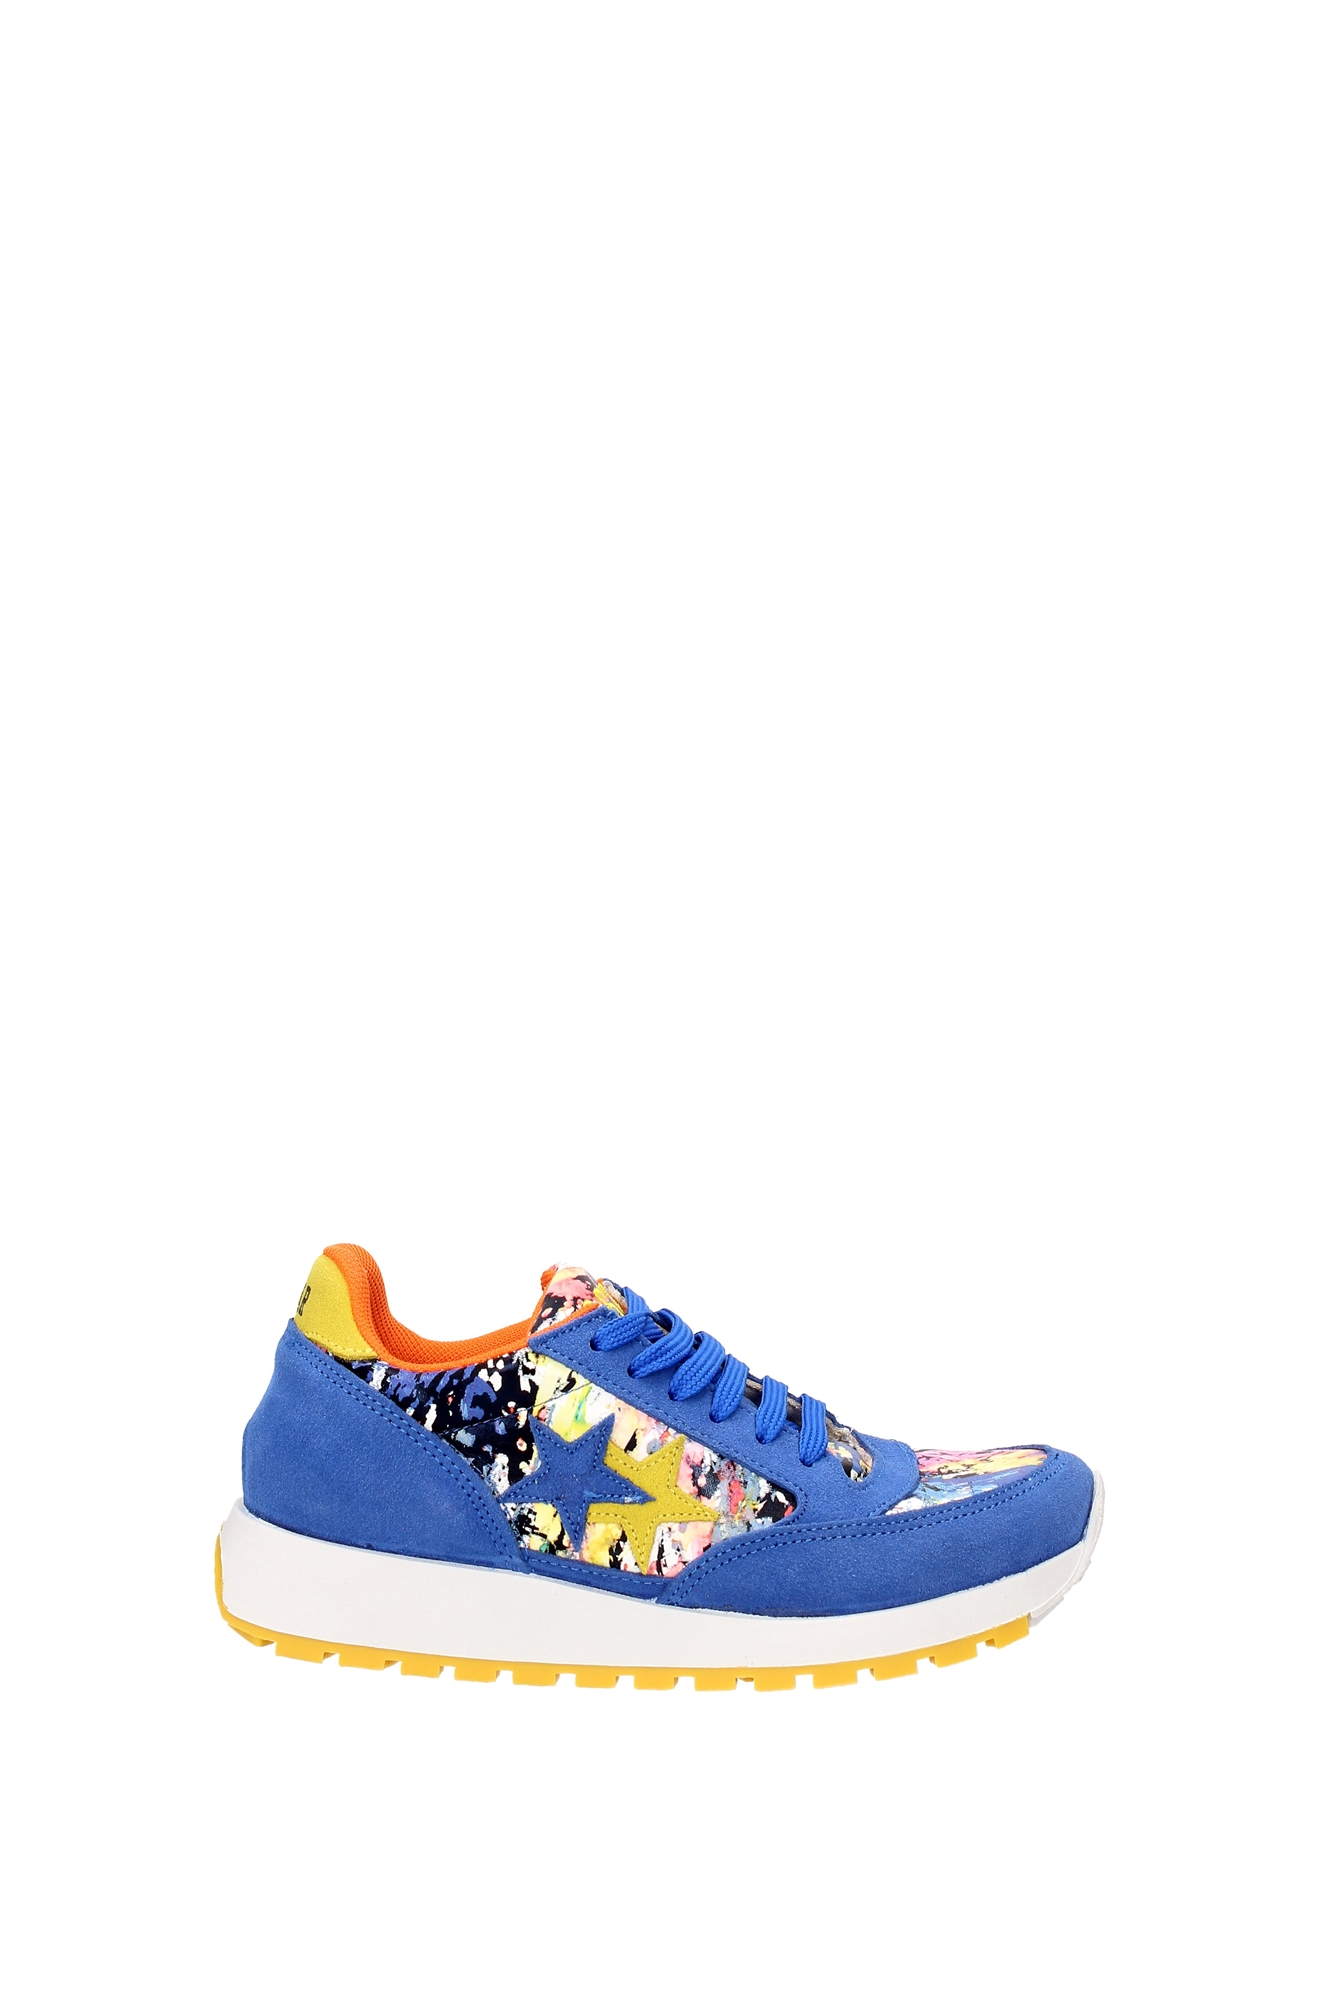 Sneakers 2star Damenschuhe - - Damenschuhe Camoscio (2SD1155FANTASIA) da4f4d